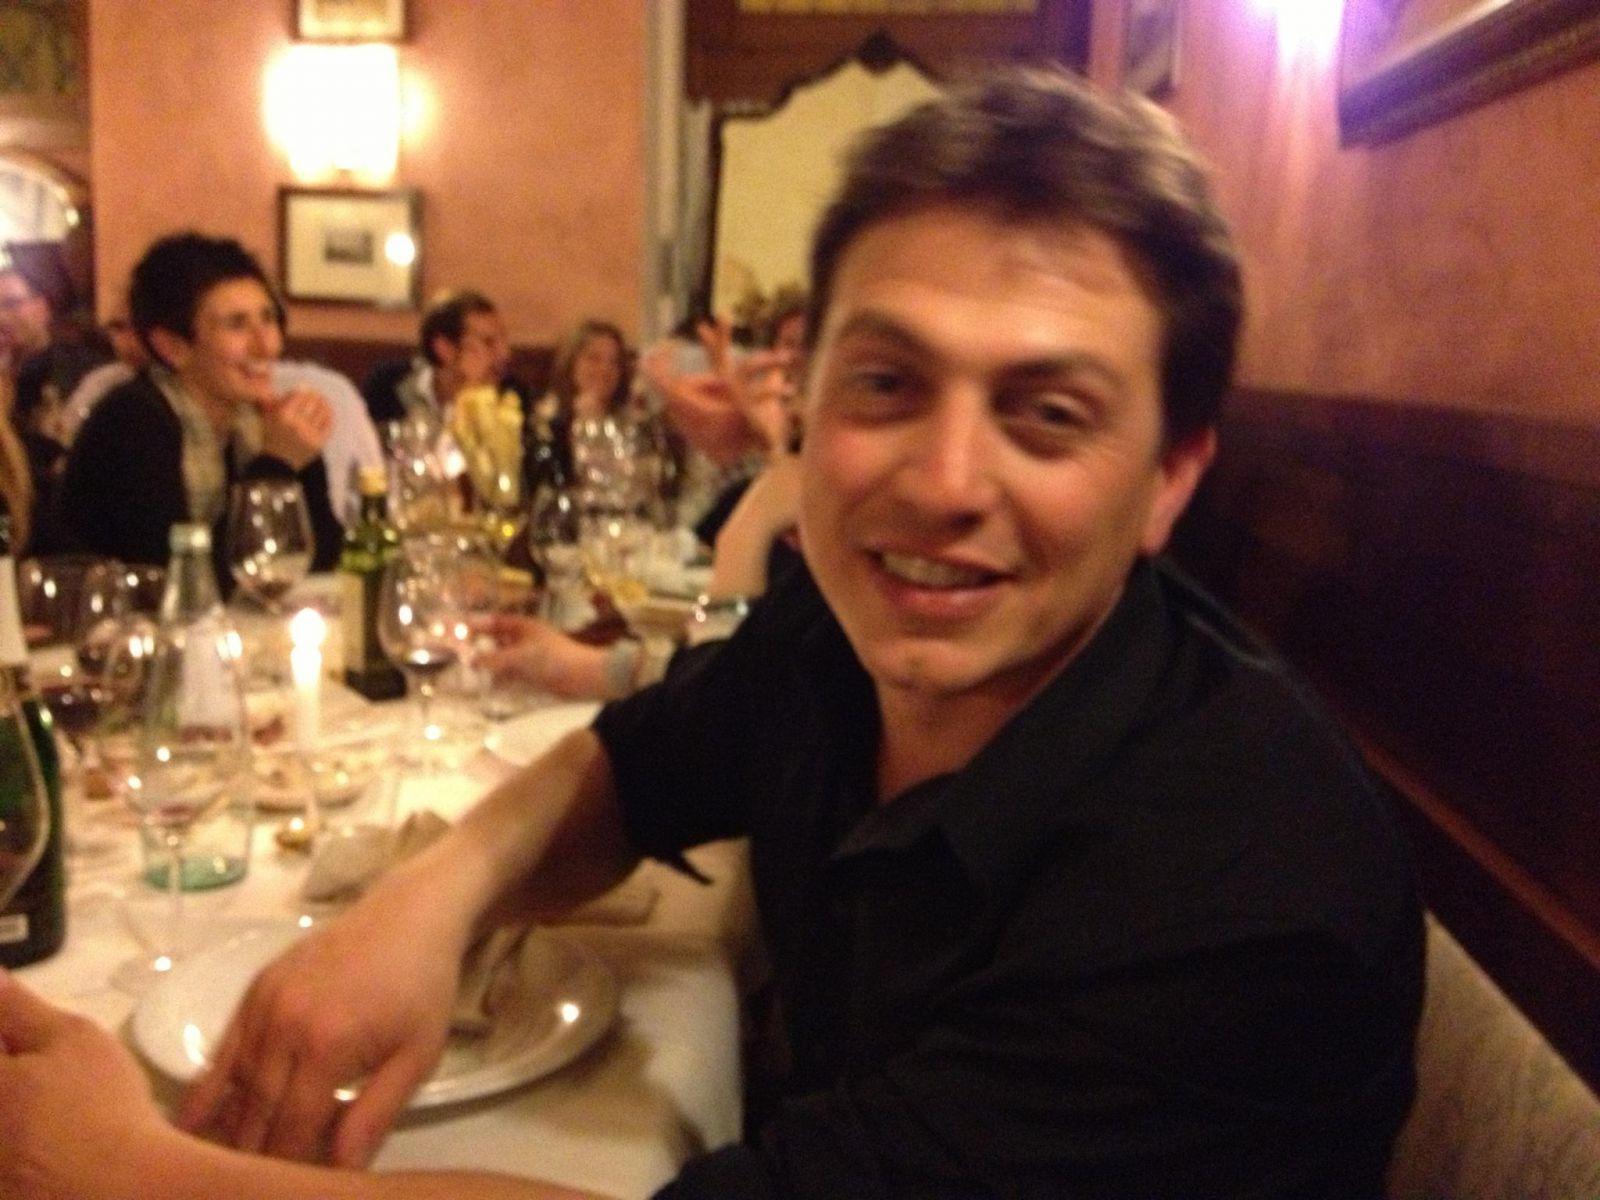 Fabio Giannetti de La Fornace